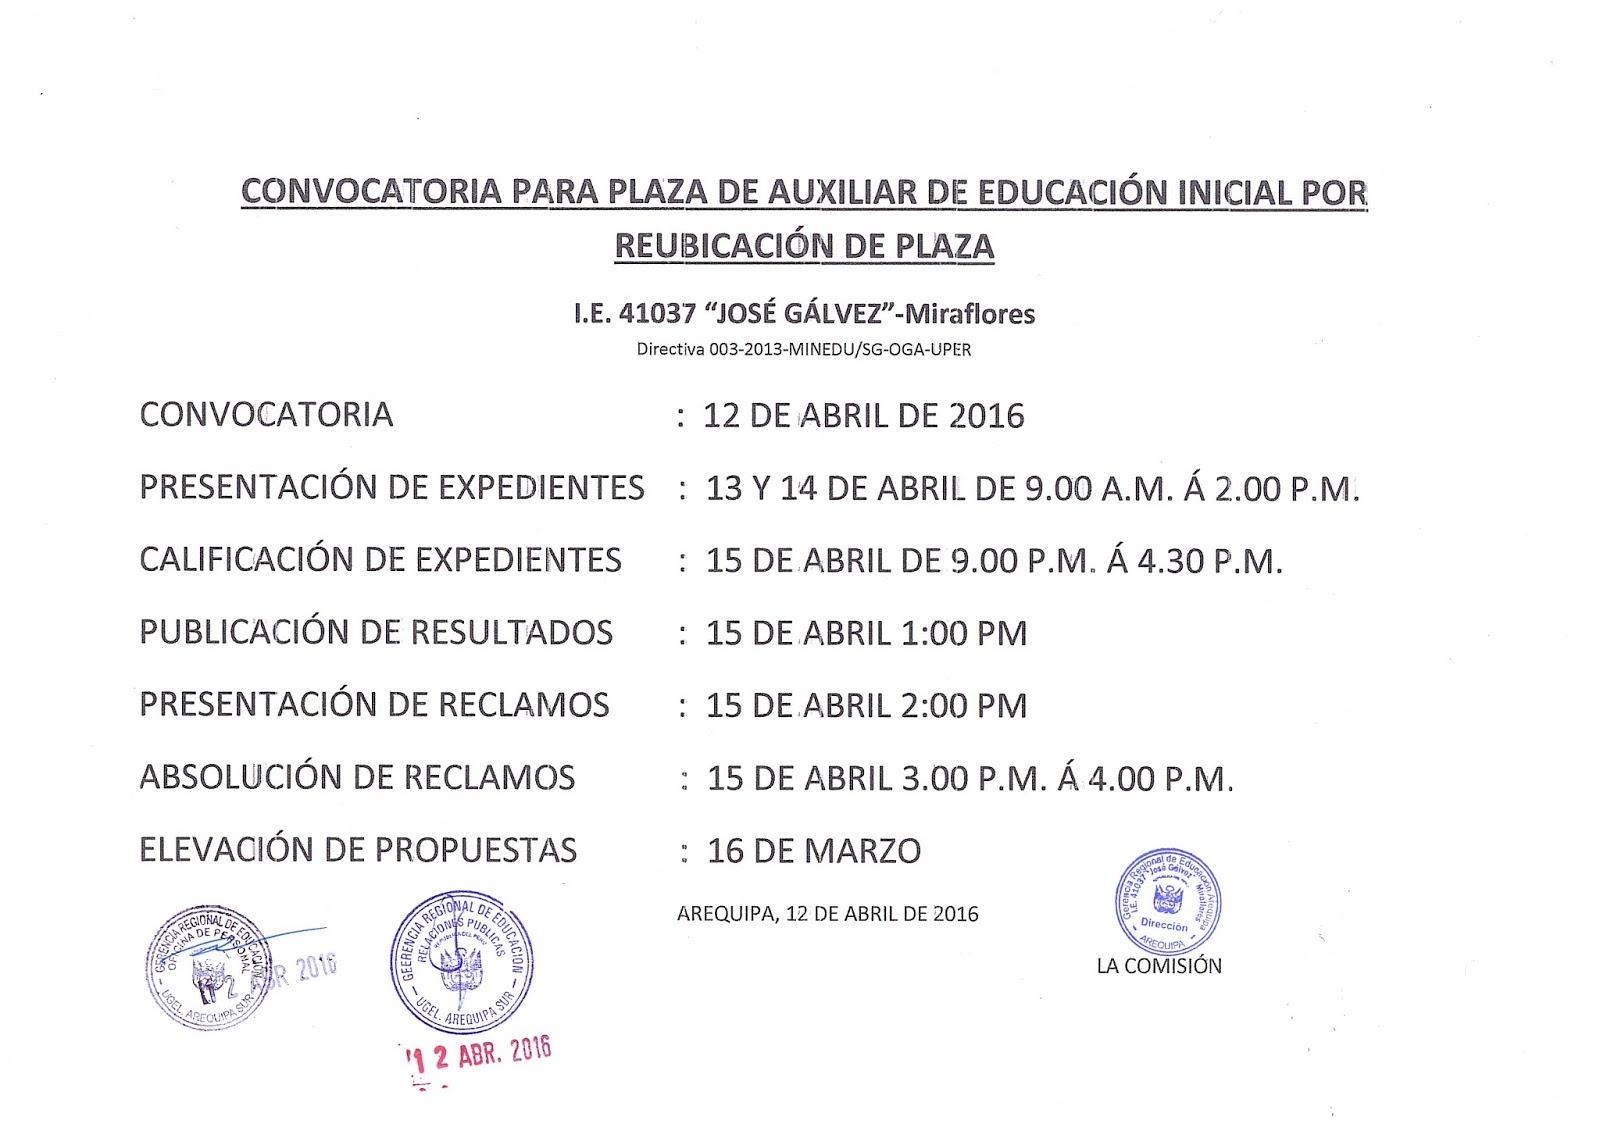 Convocatoria para plaza de auxiliar de educaci n inicial i Convocatoria para las plazas docentes 2016